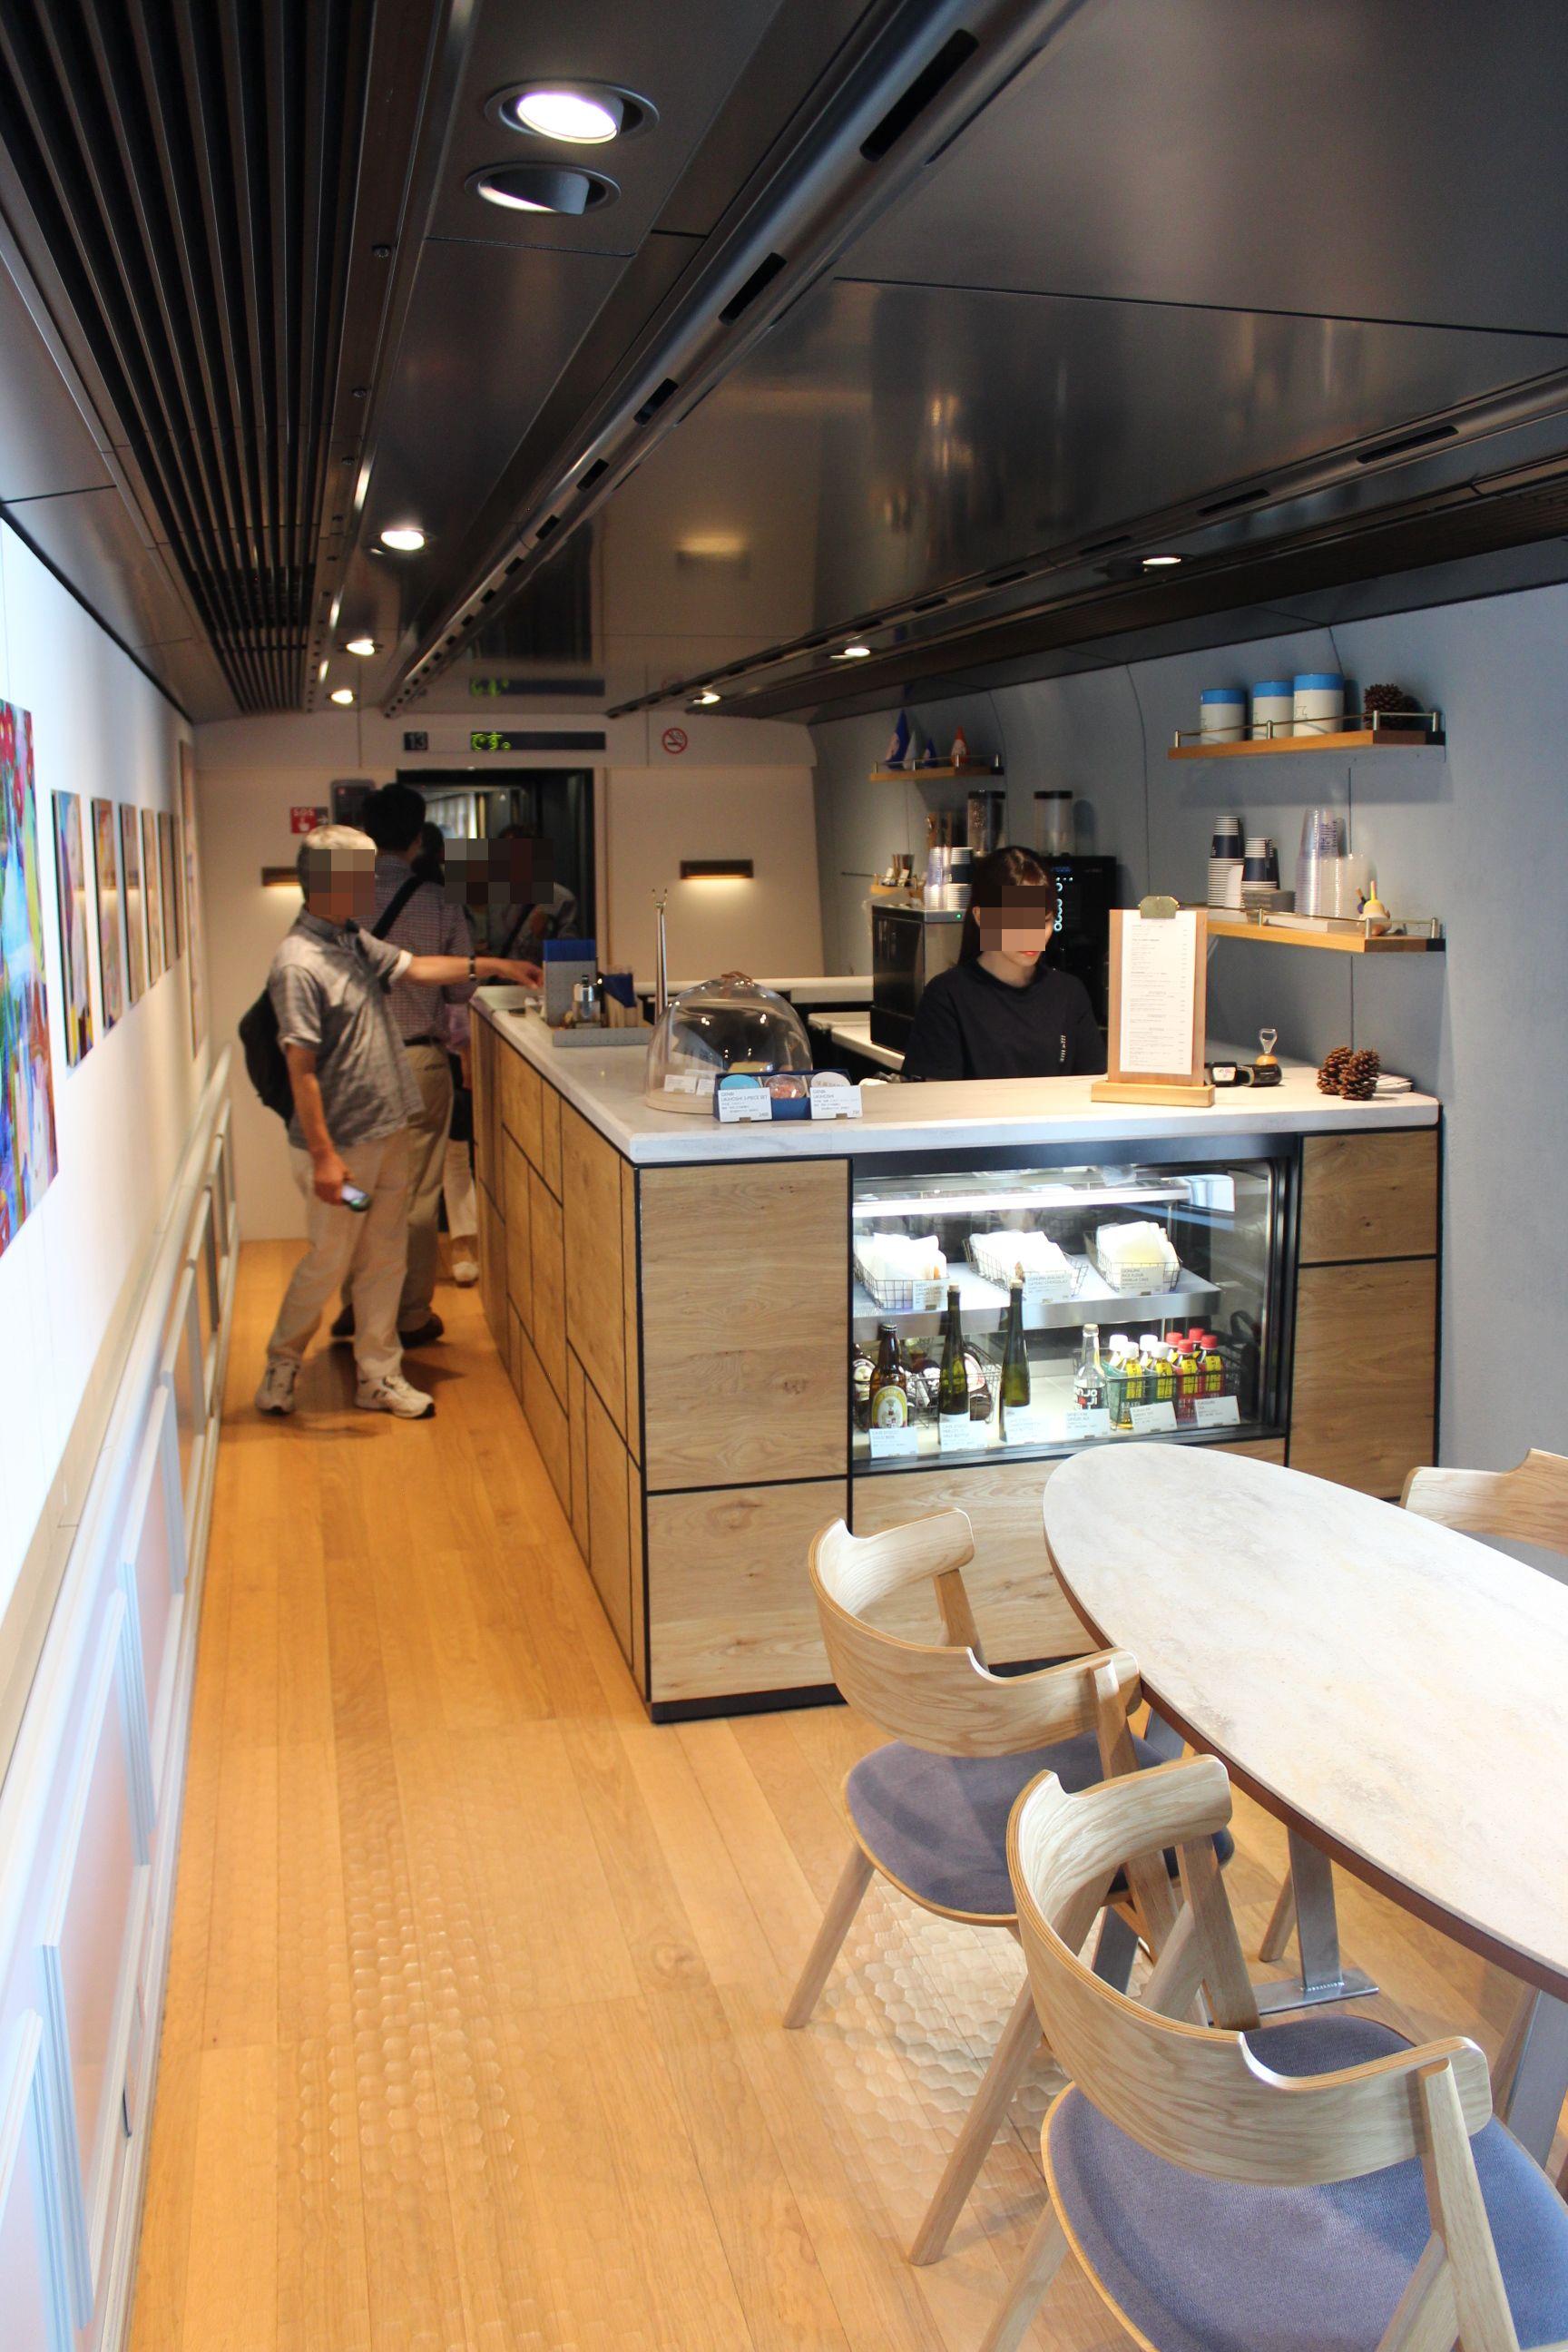 e3-700 genbi shinkansen car13 cafe.jpg